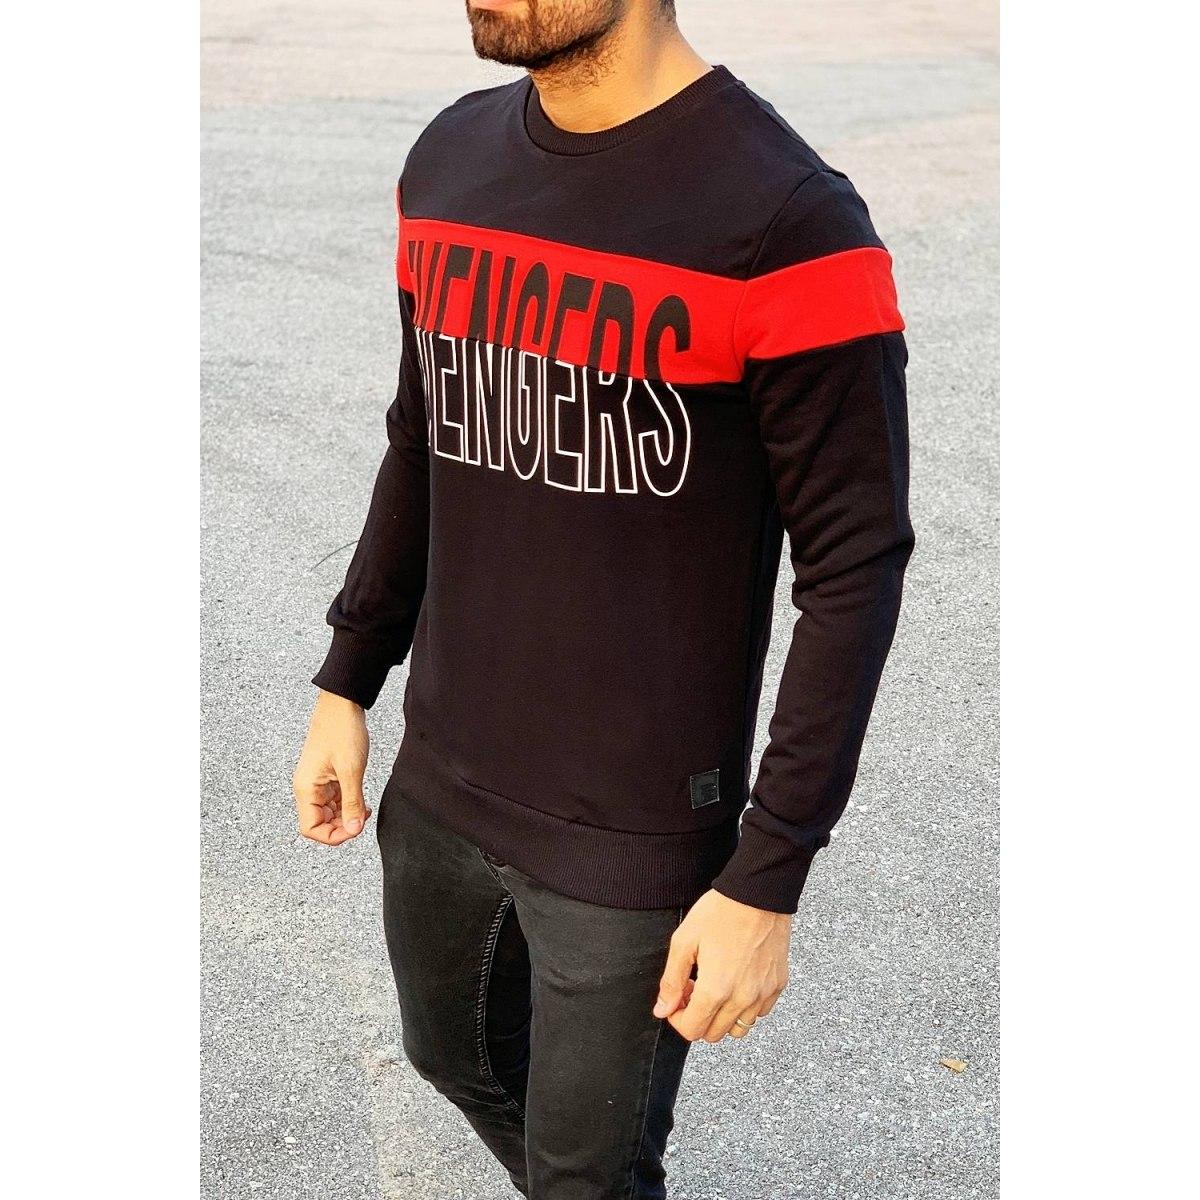 Evengers Sweatshirt in Black Mv Premium Brand - 2